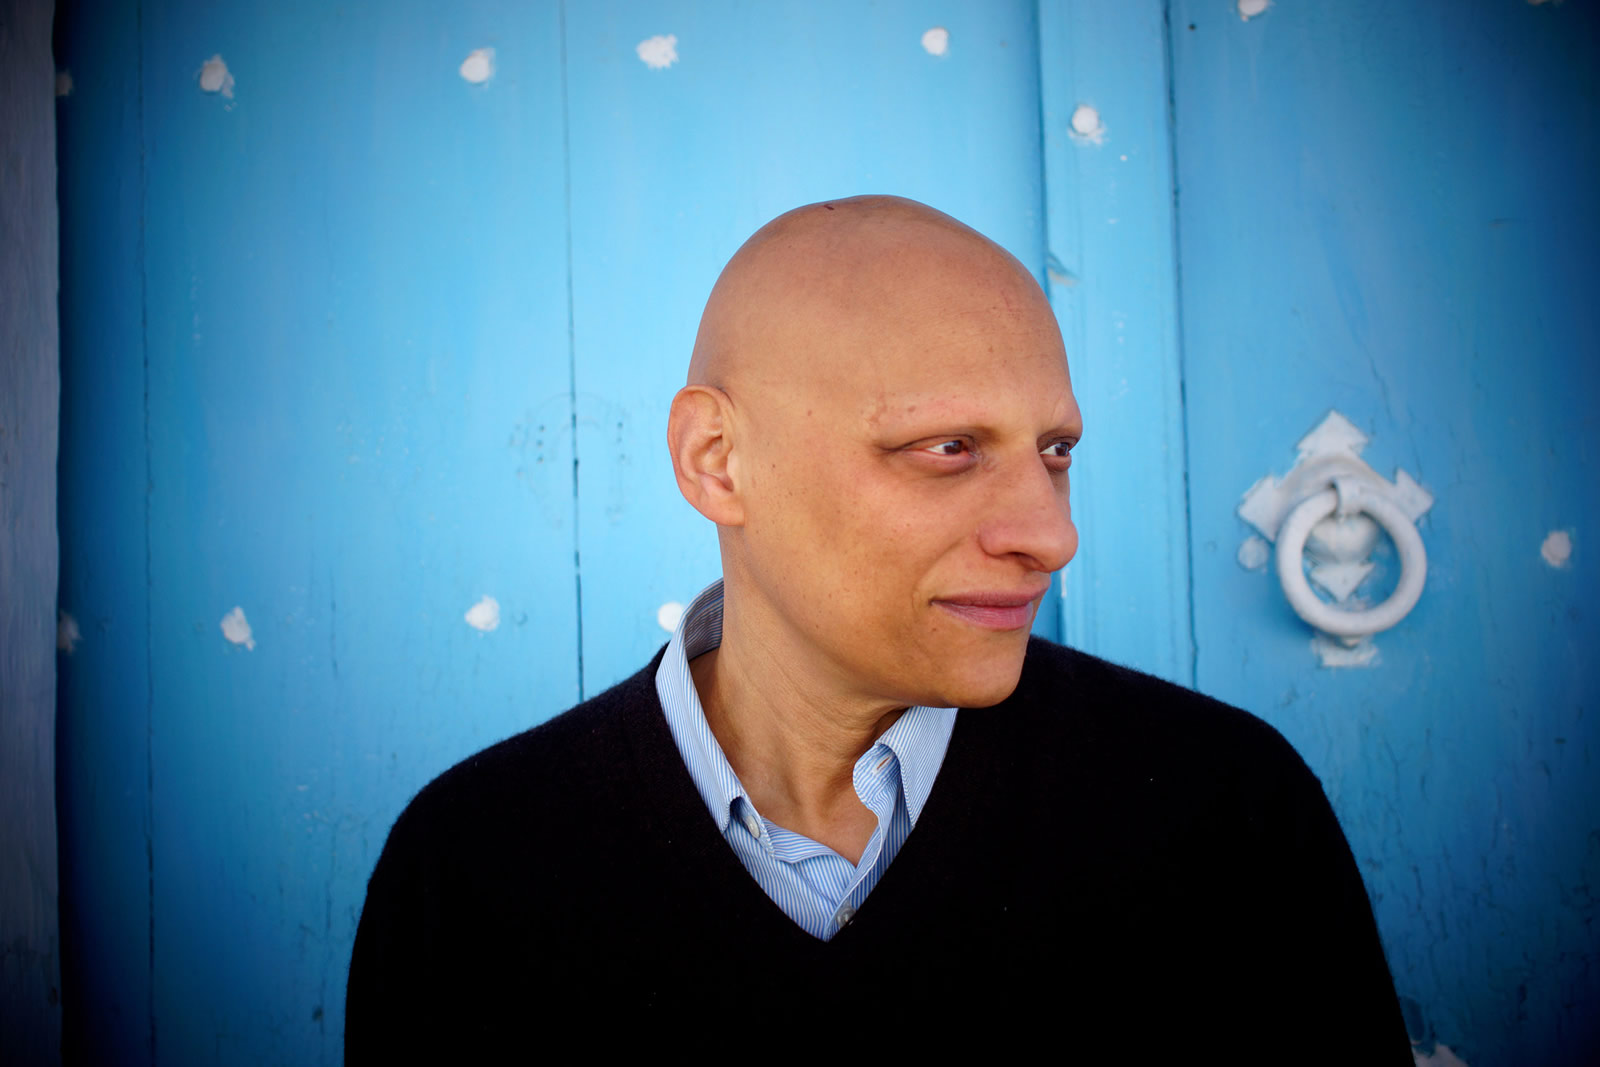 Dominique Dalcan | Brian Eno, Peter Schmidt